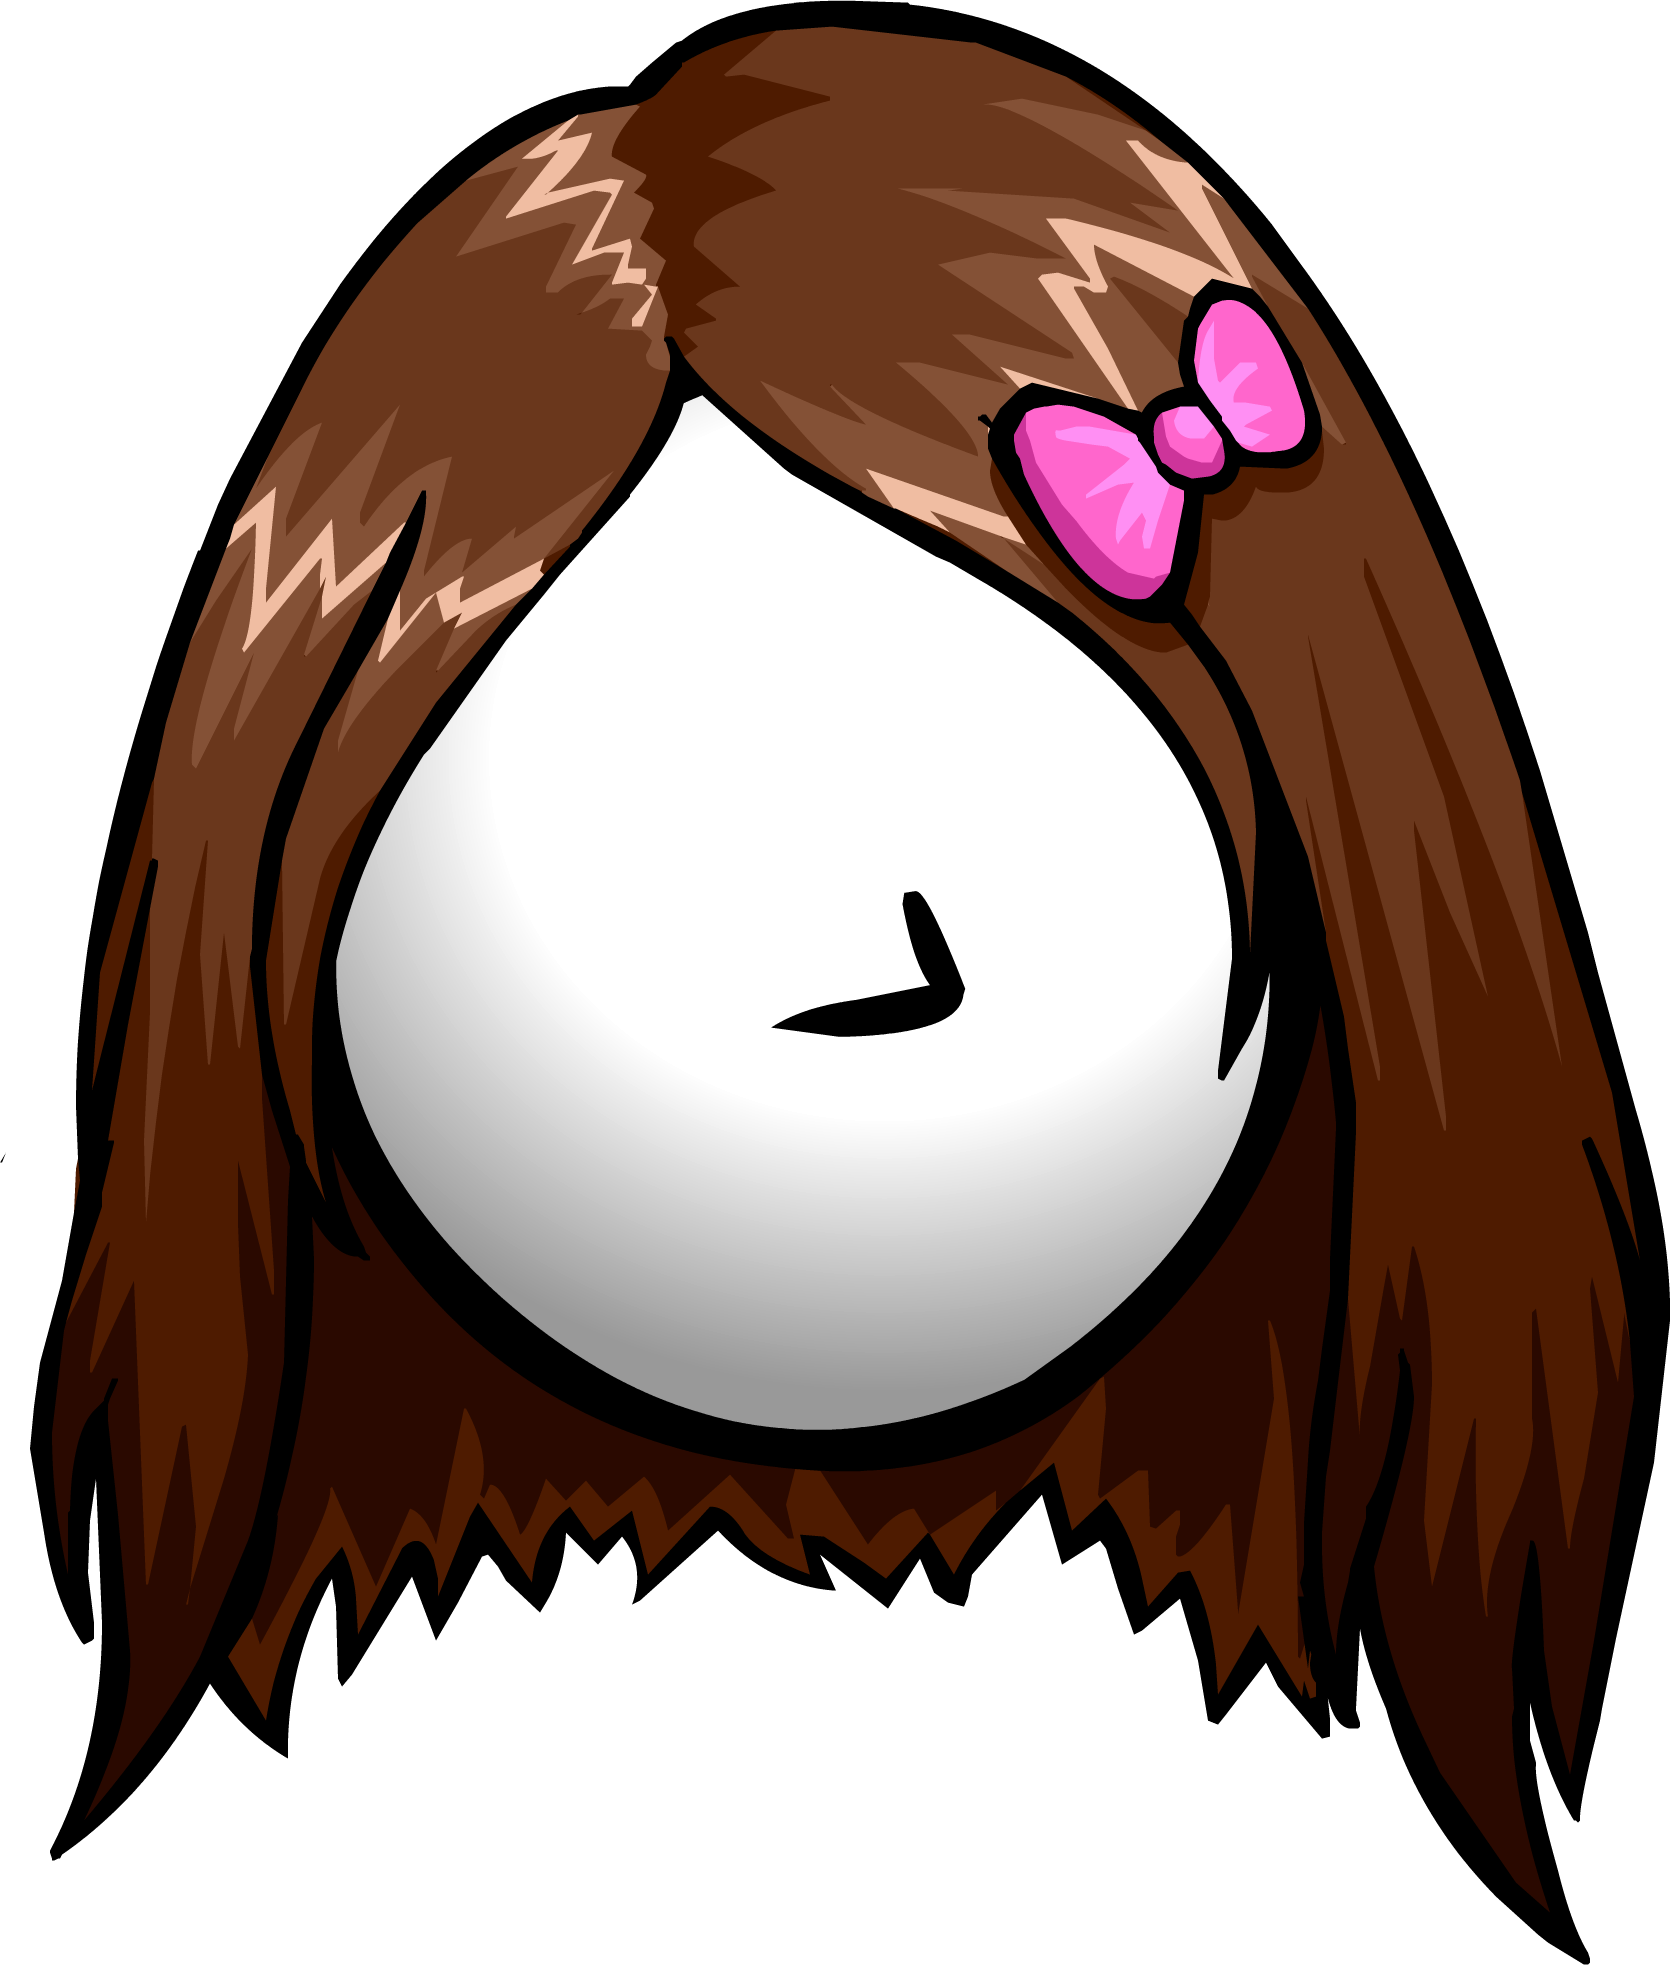 The Flutterby | Club Penguin Wiki | FANDOM powered by Wikia